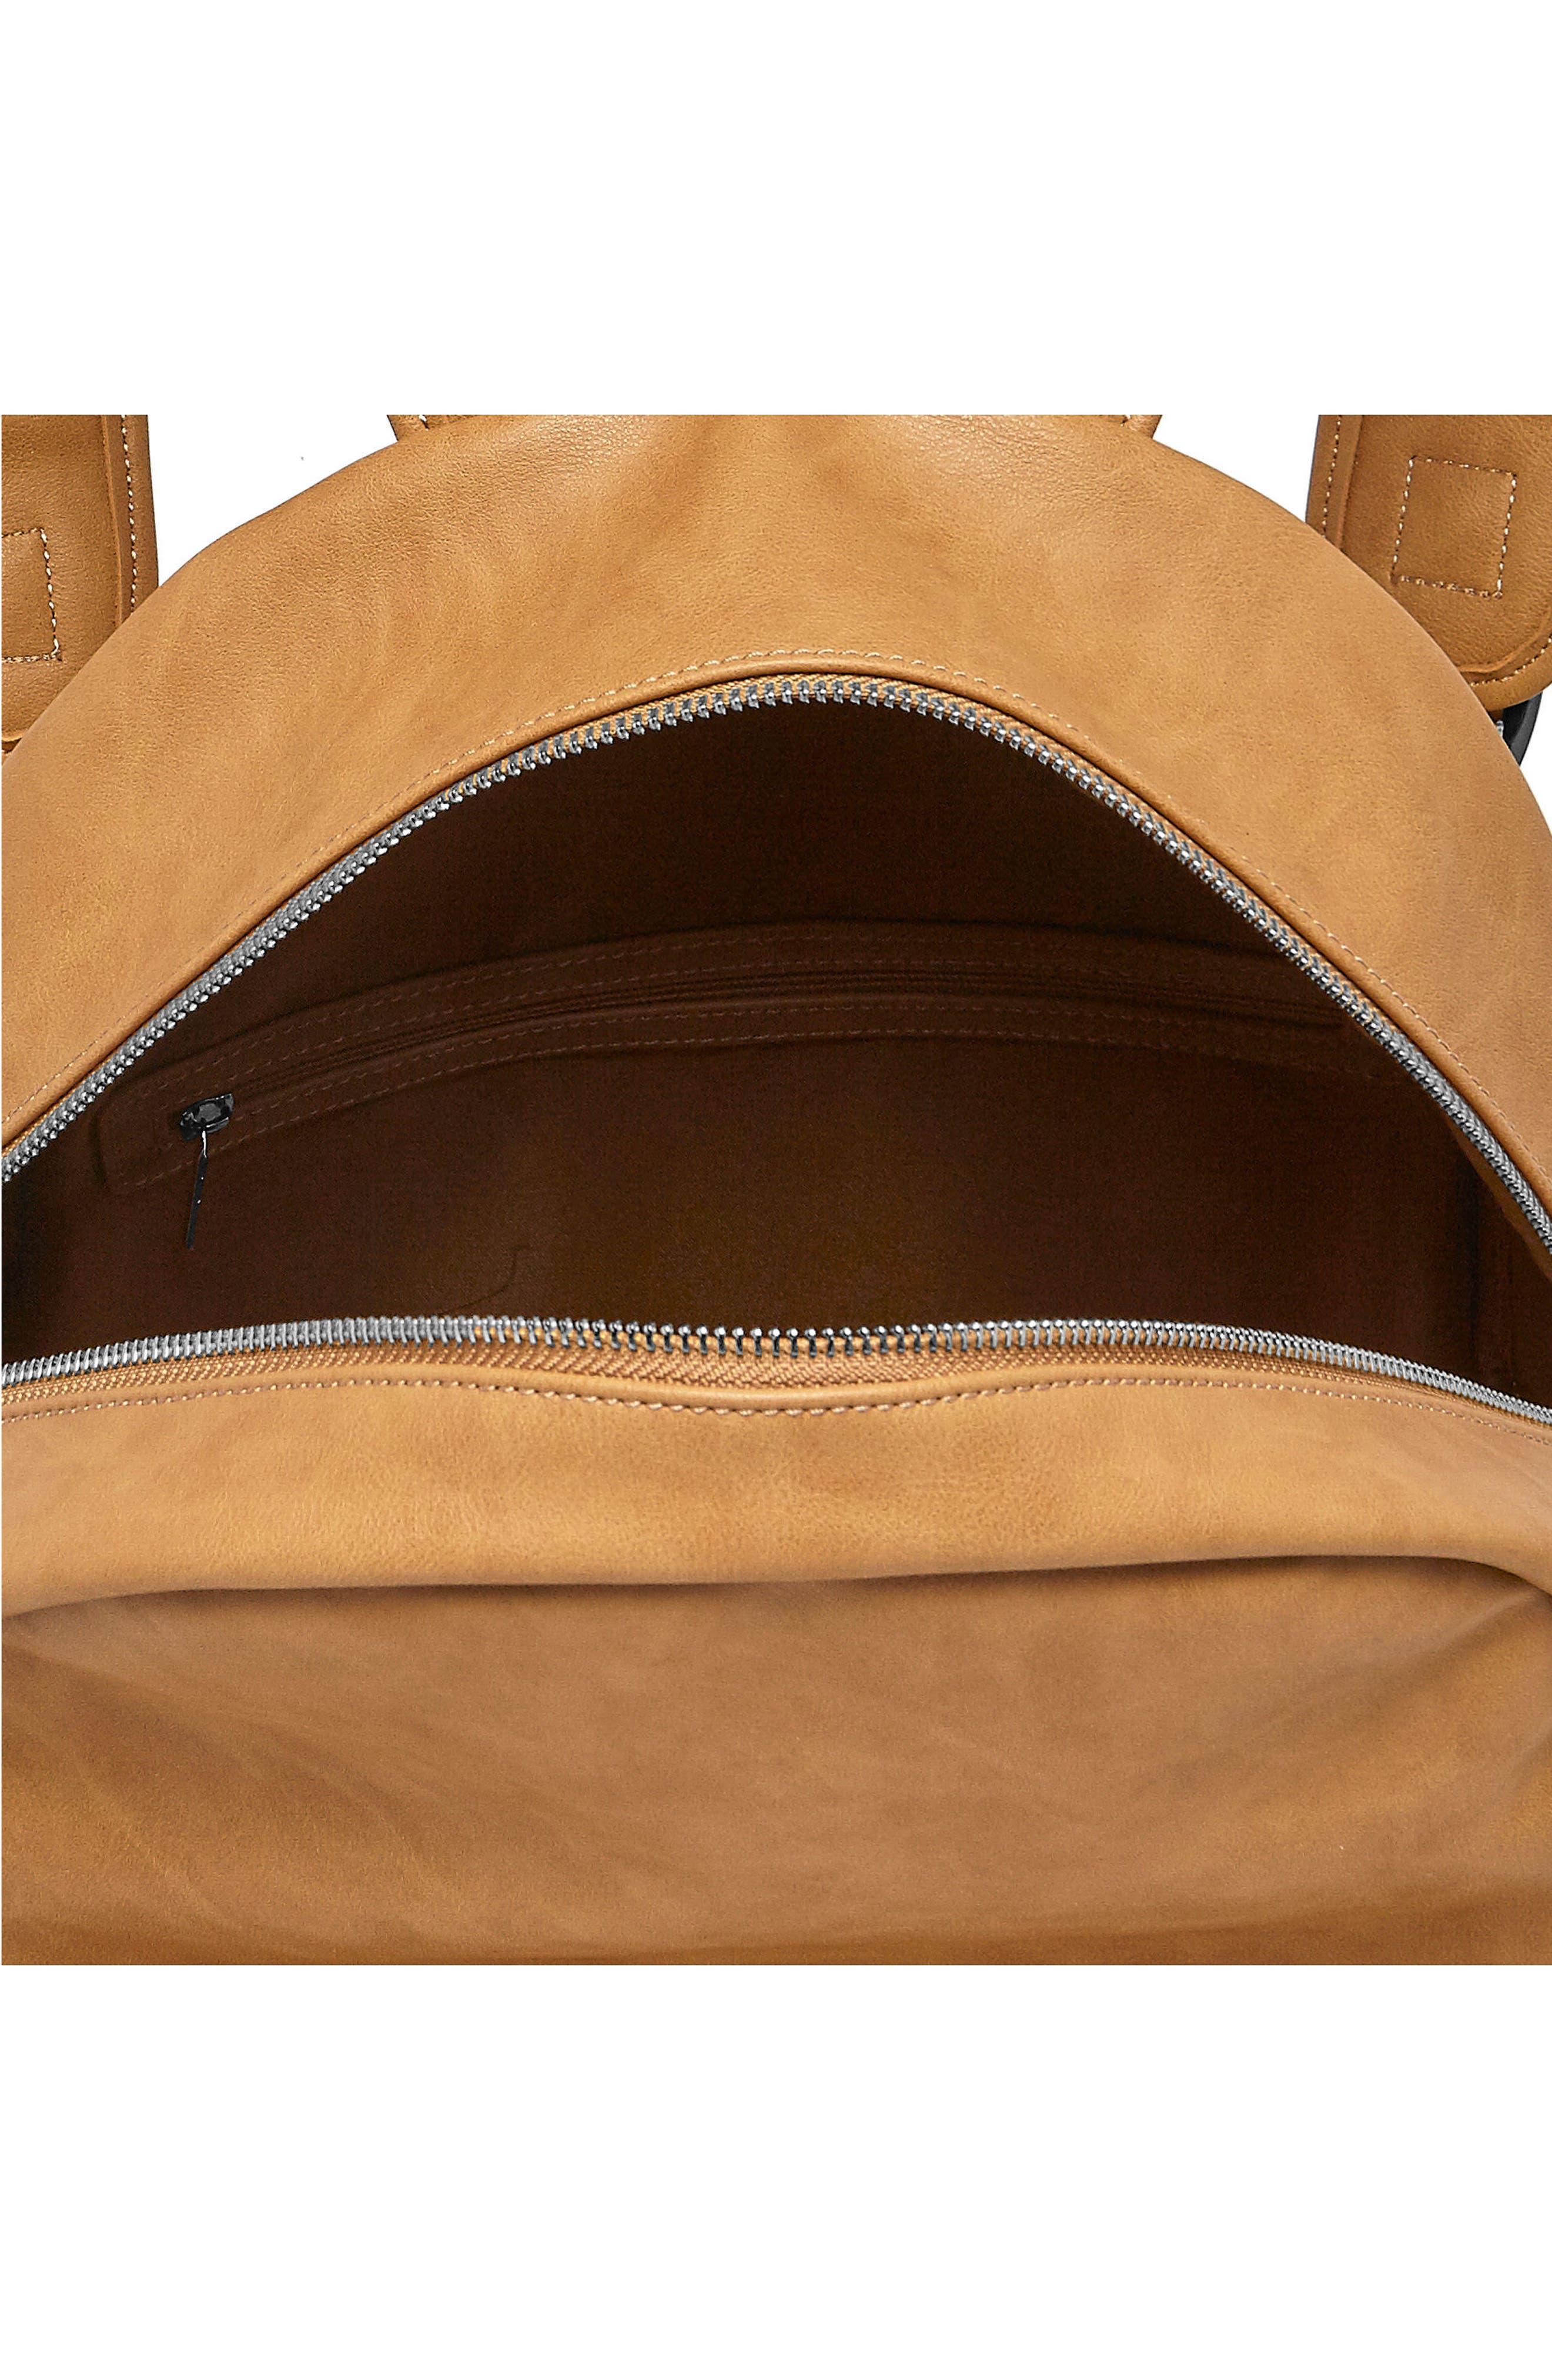 Practical Vegan Leather Backpack,                             Alternate thumbnail 3, color,                             Camel